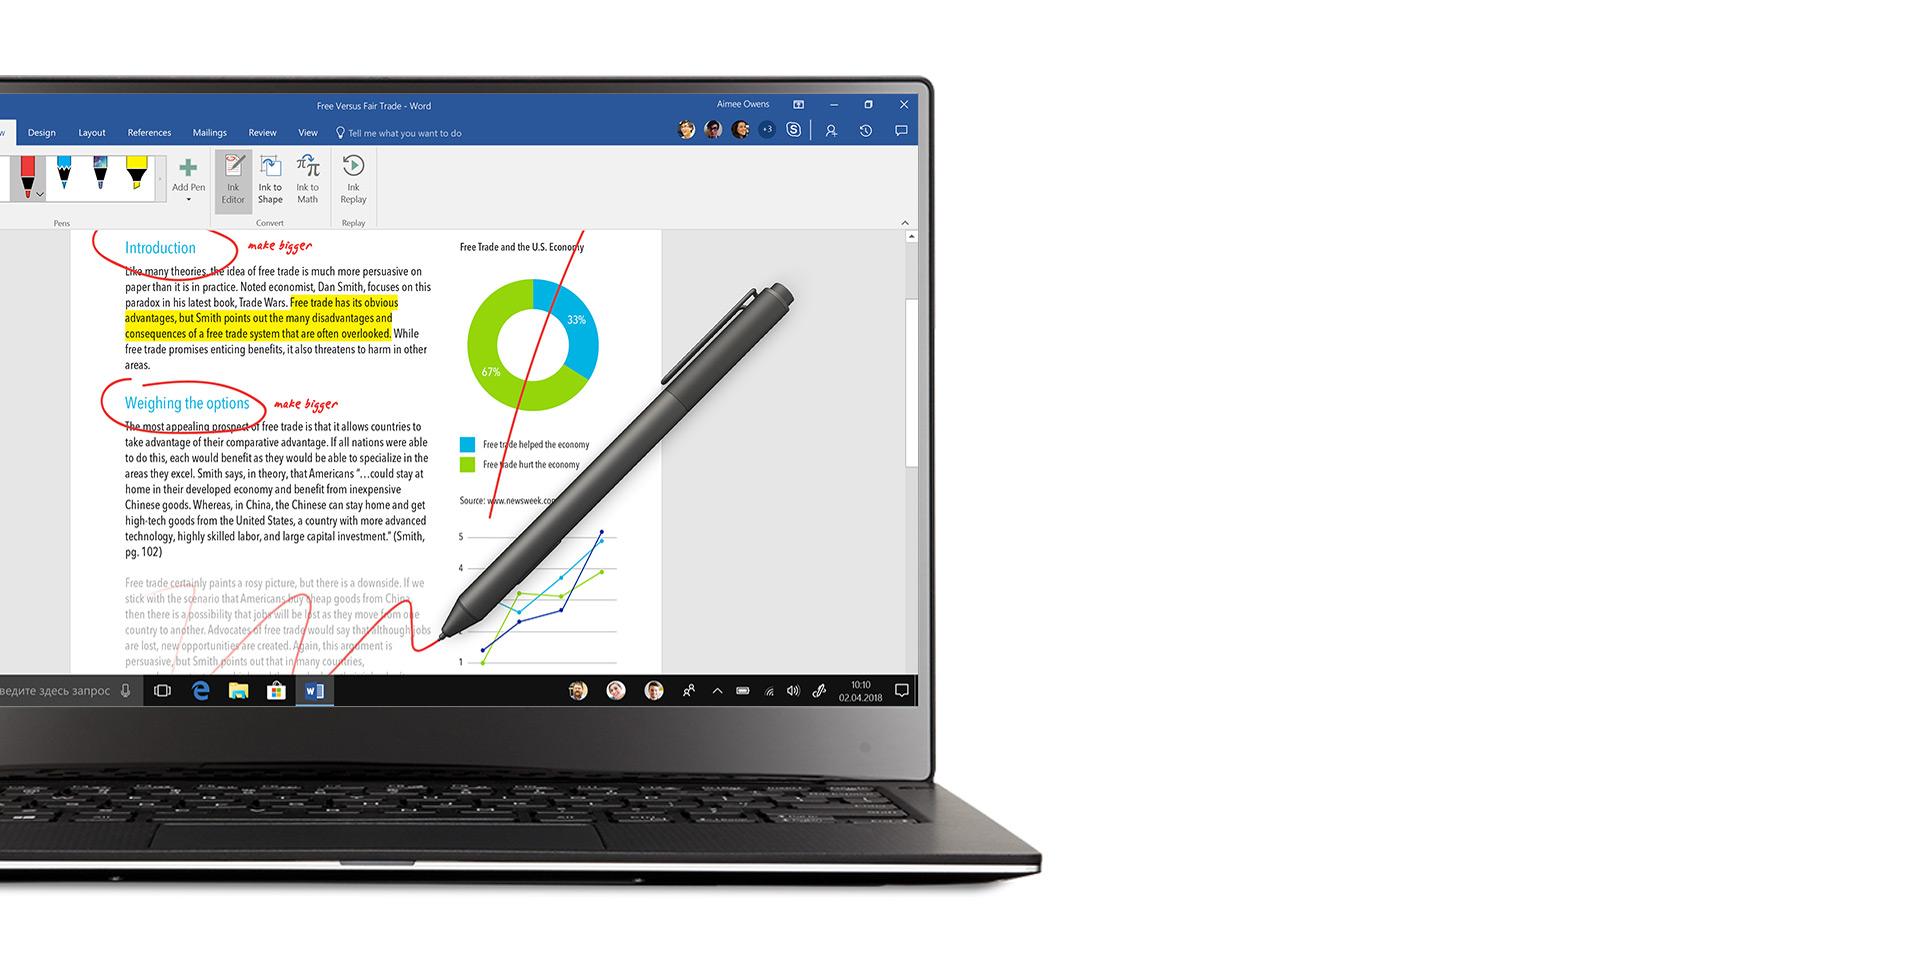 Ноутбук Windows10 с Word на экране